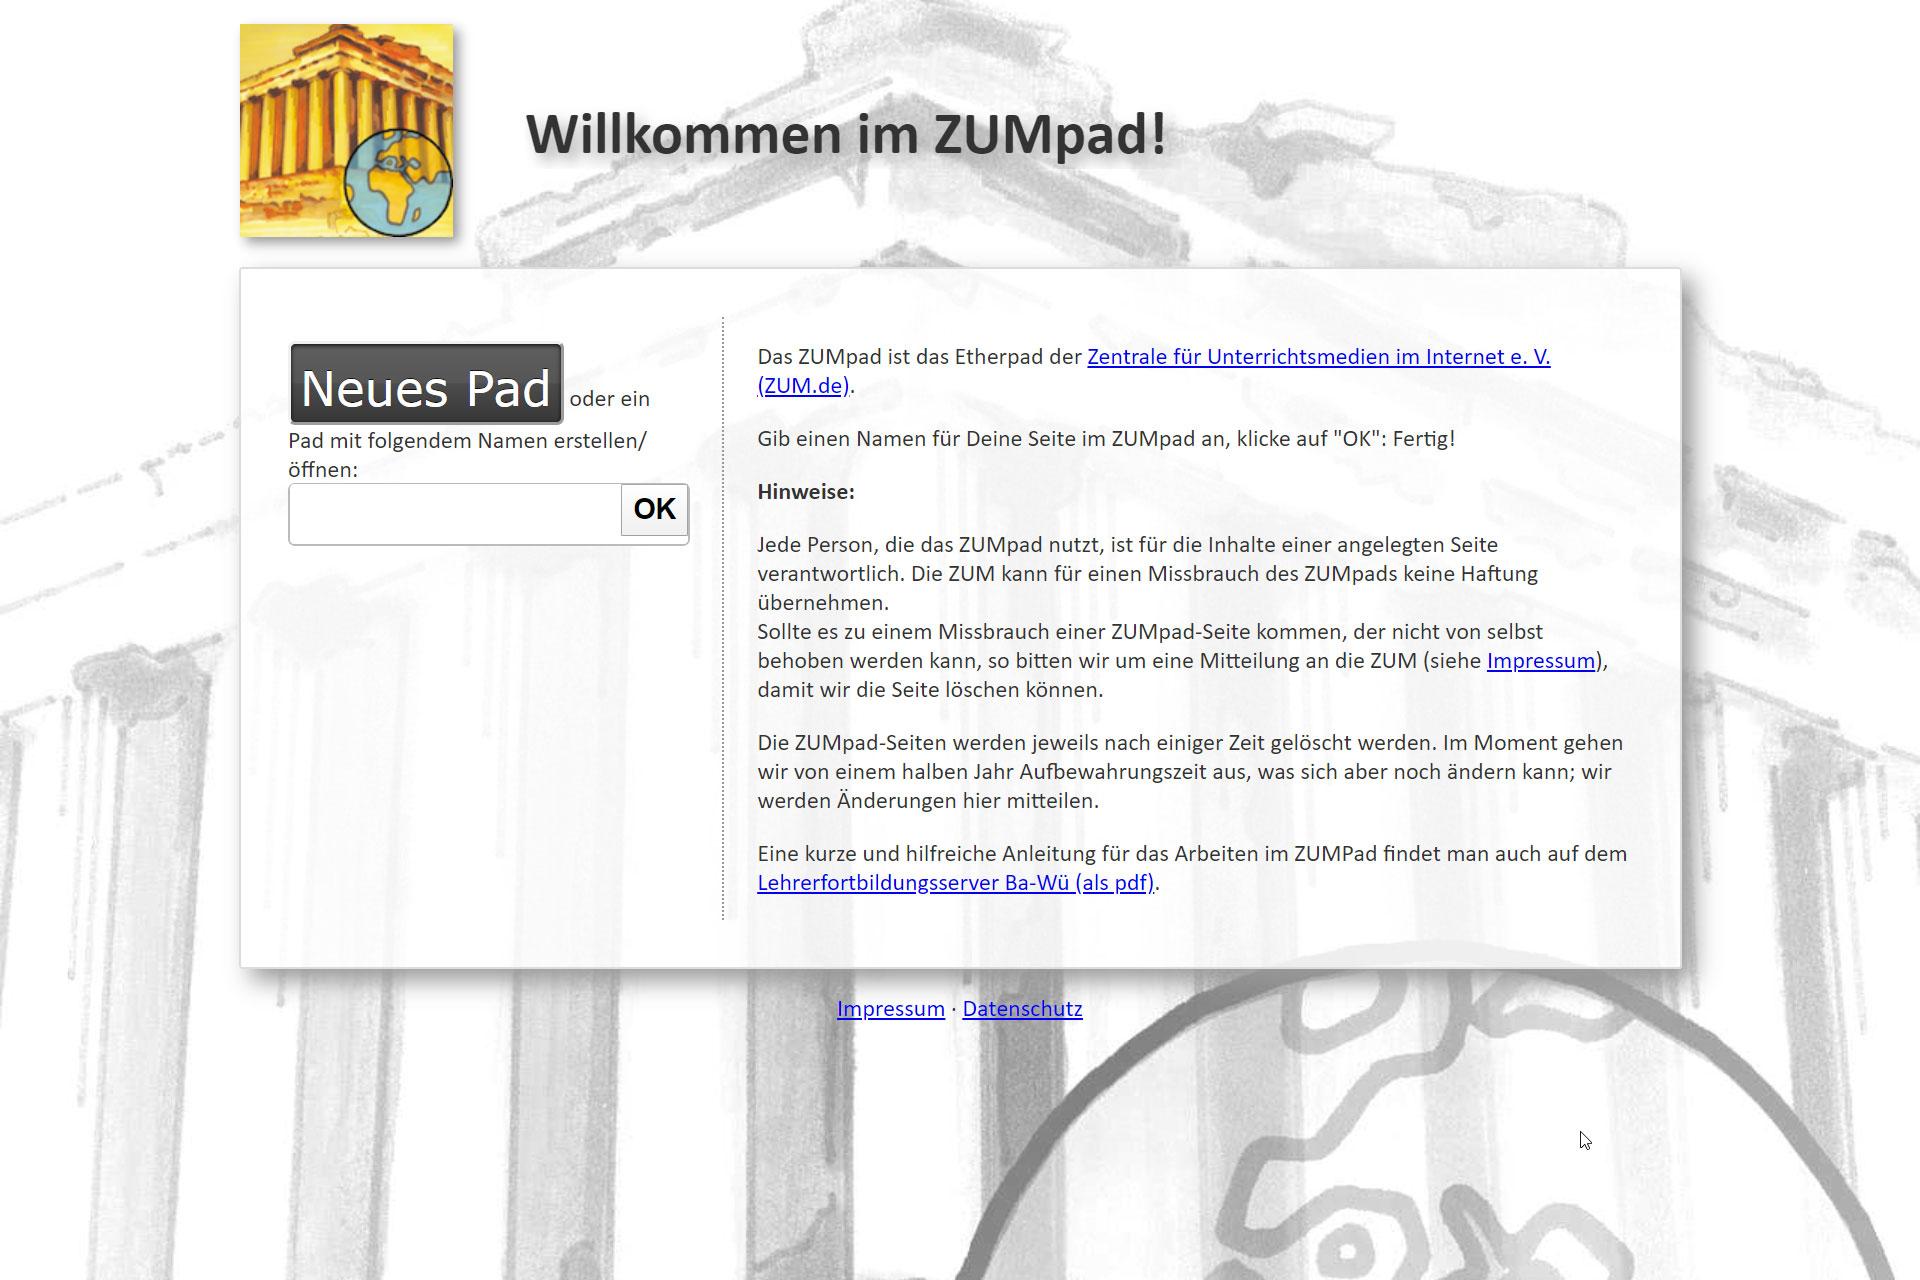 Screenshot Webseite ZUMpad (29.04.2020)